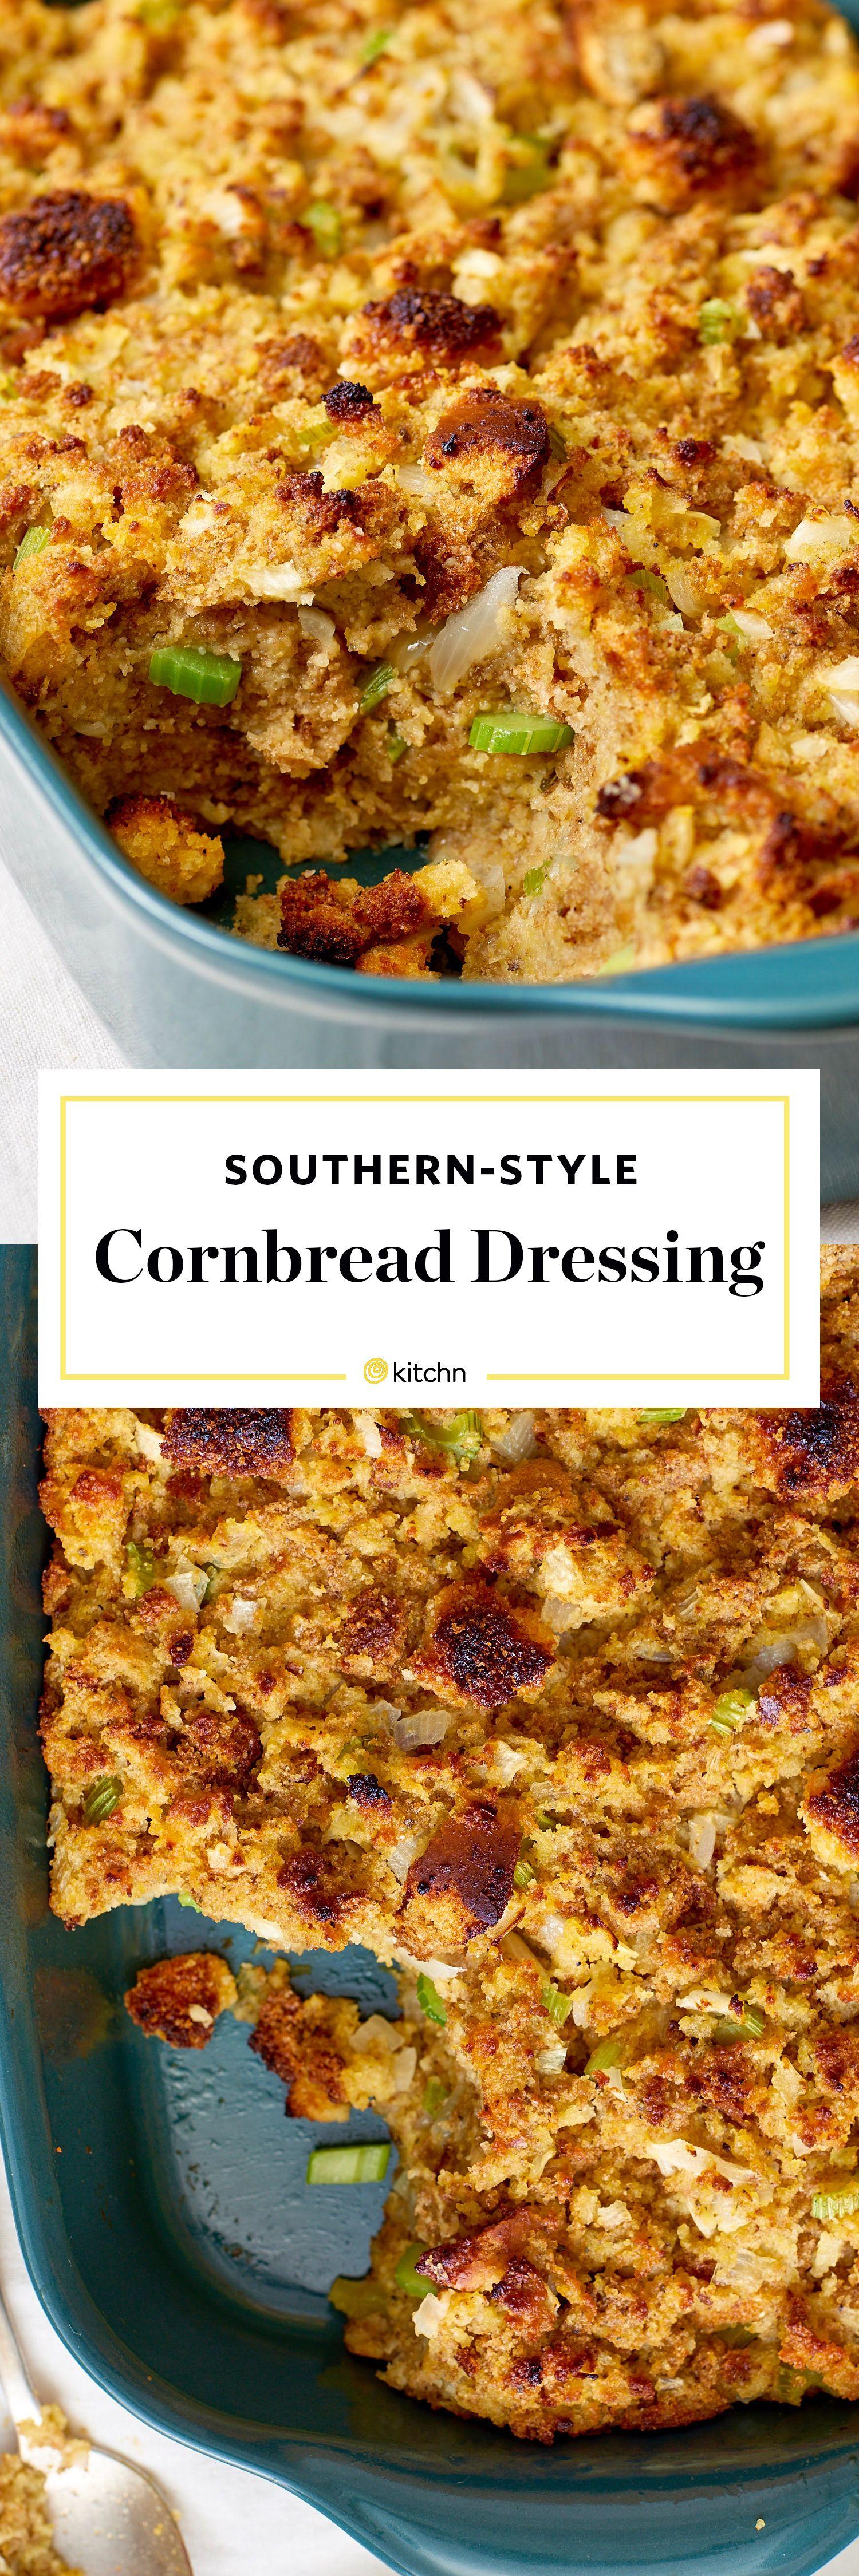 Recipe: Southern-Style Cornbread Dressing